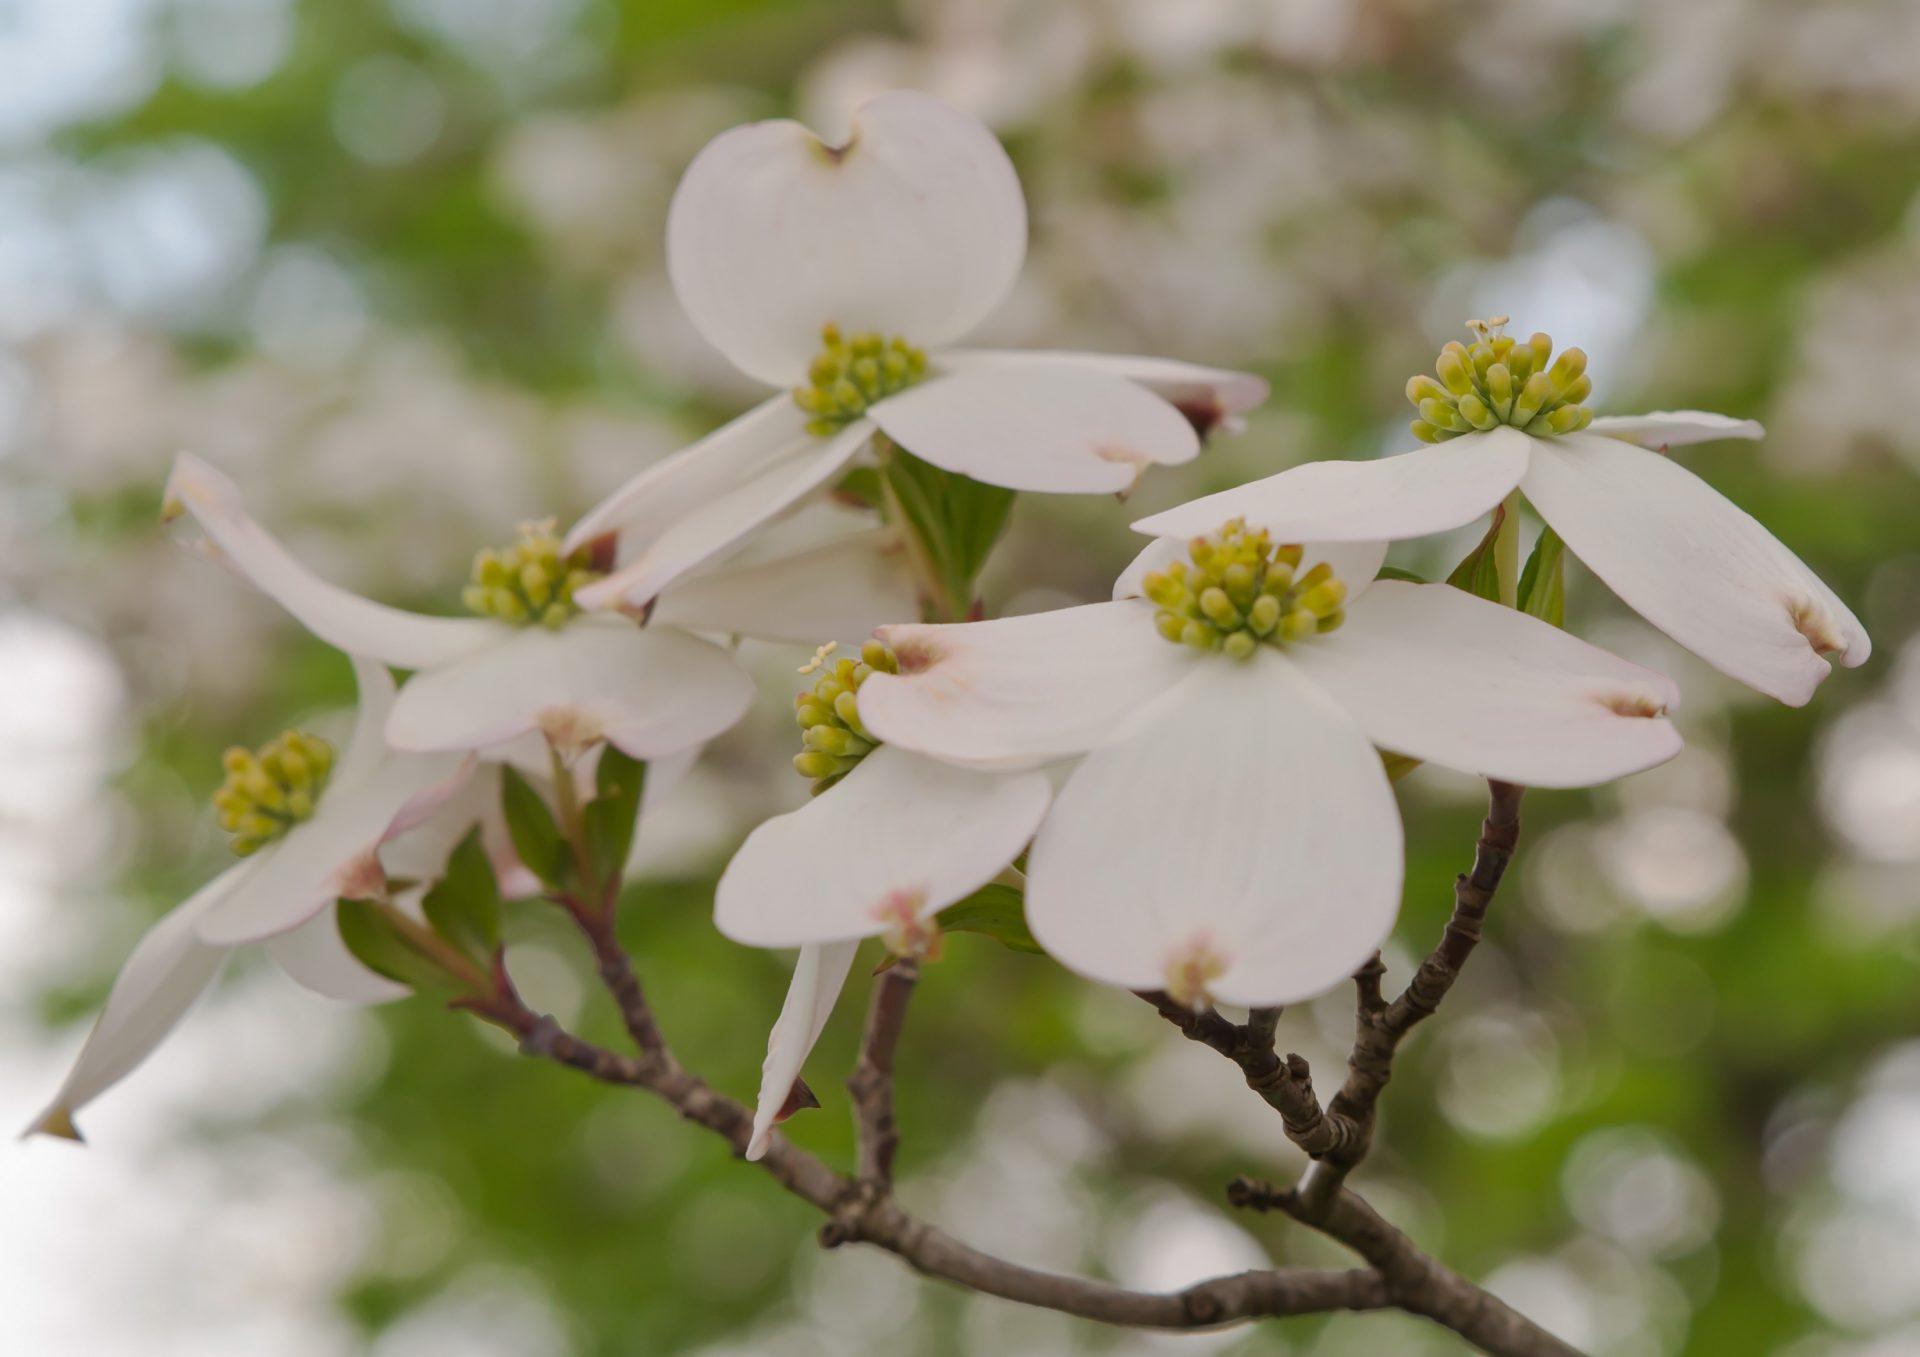 Tree Service Treats Dogwood Anthracnose